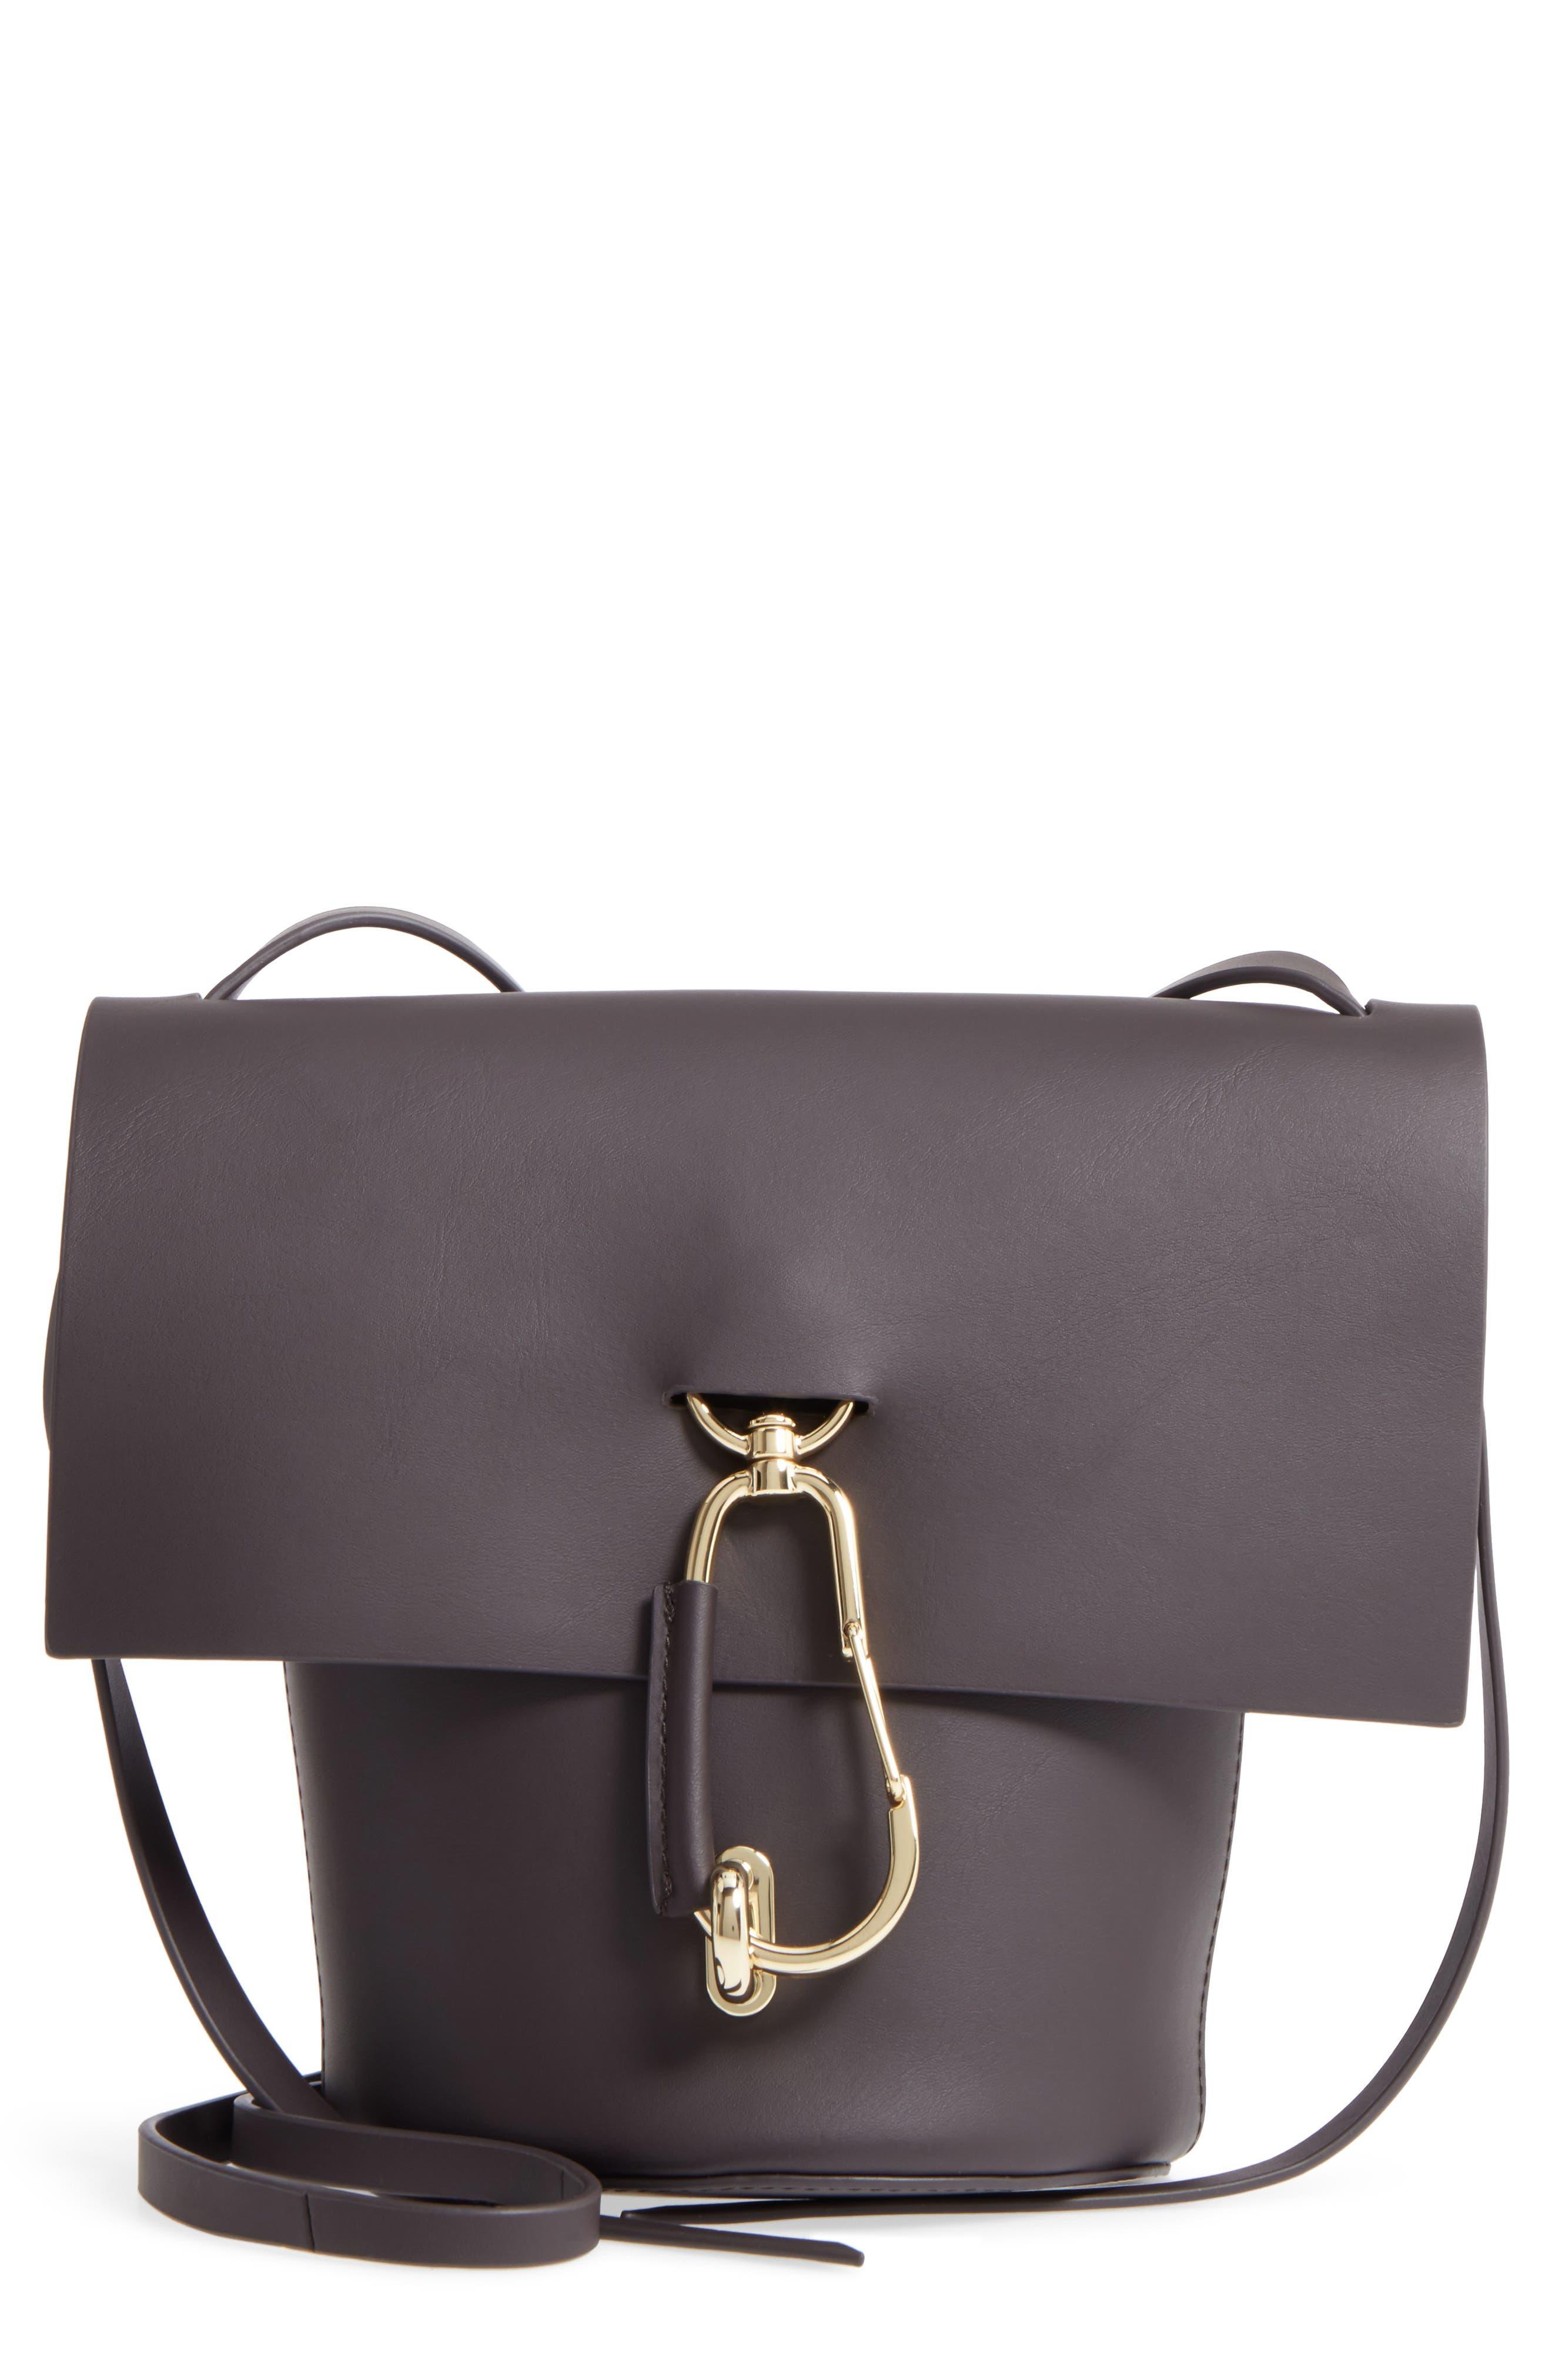 Alternate Image 1 Selected - ZAC Zac Posen Belay Calfskin Leather Crossbody Bucket Bag